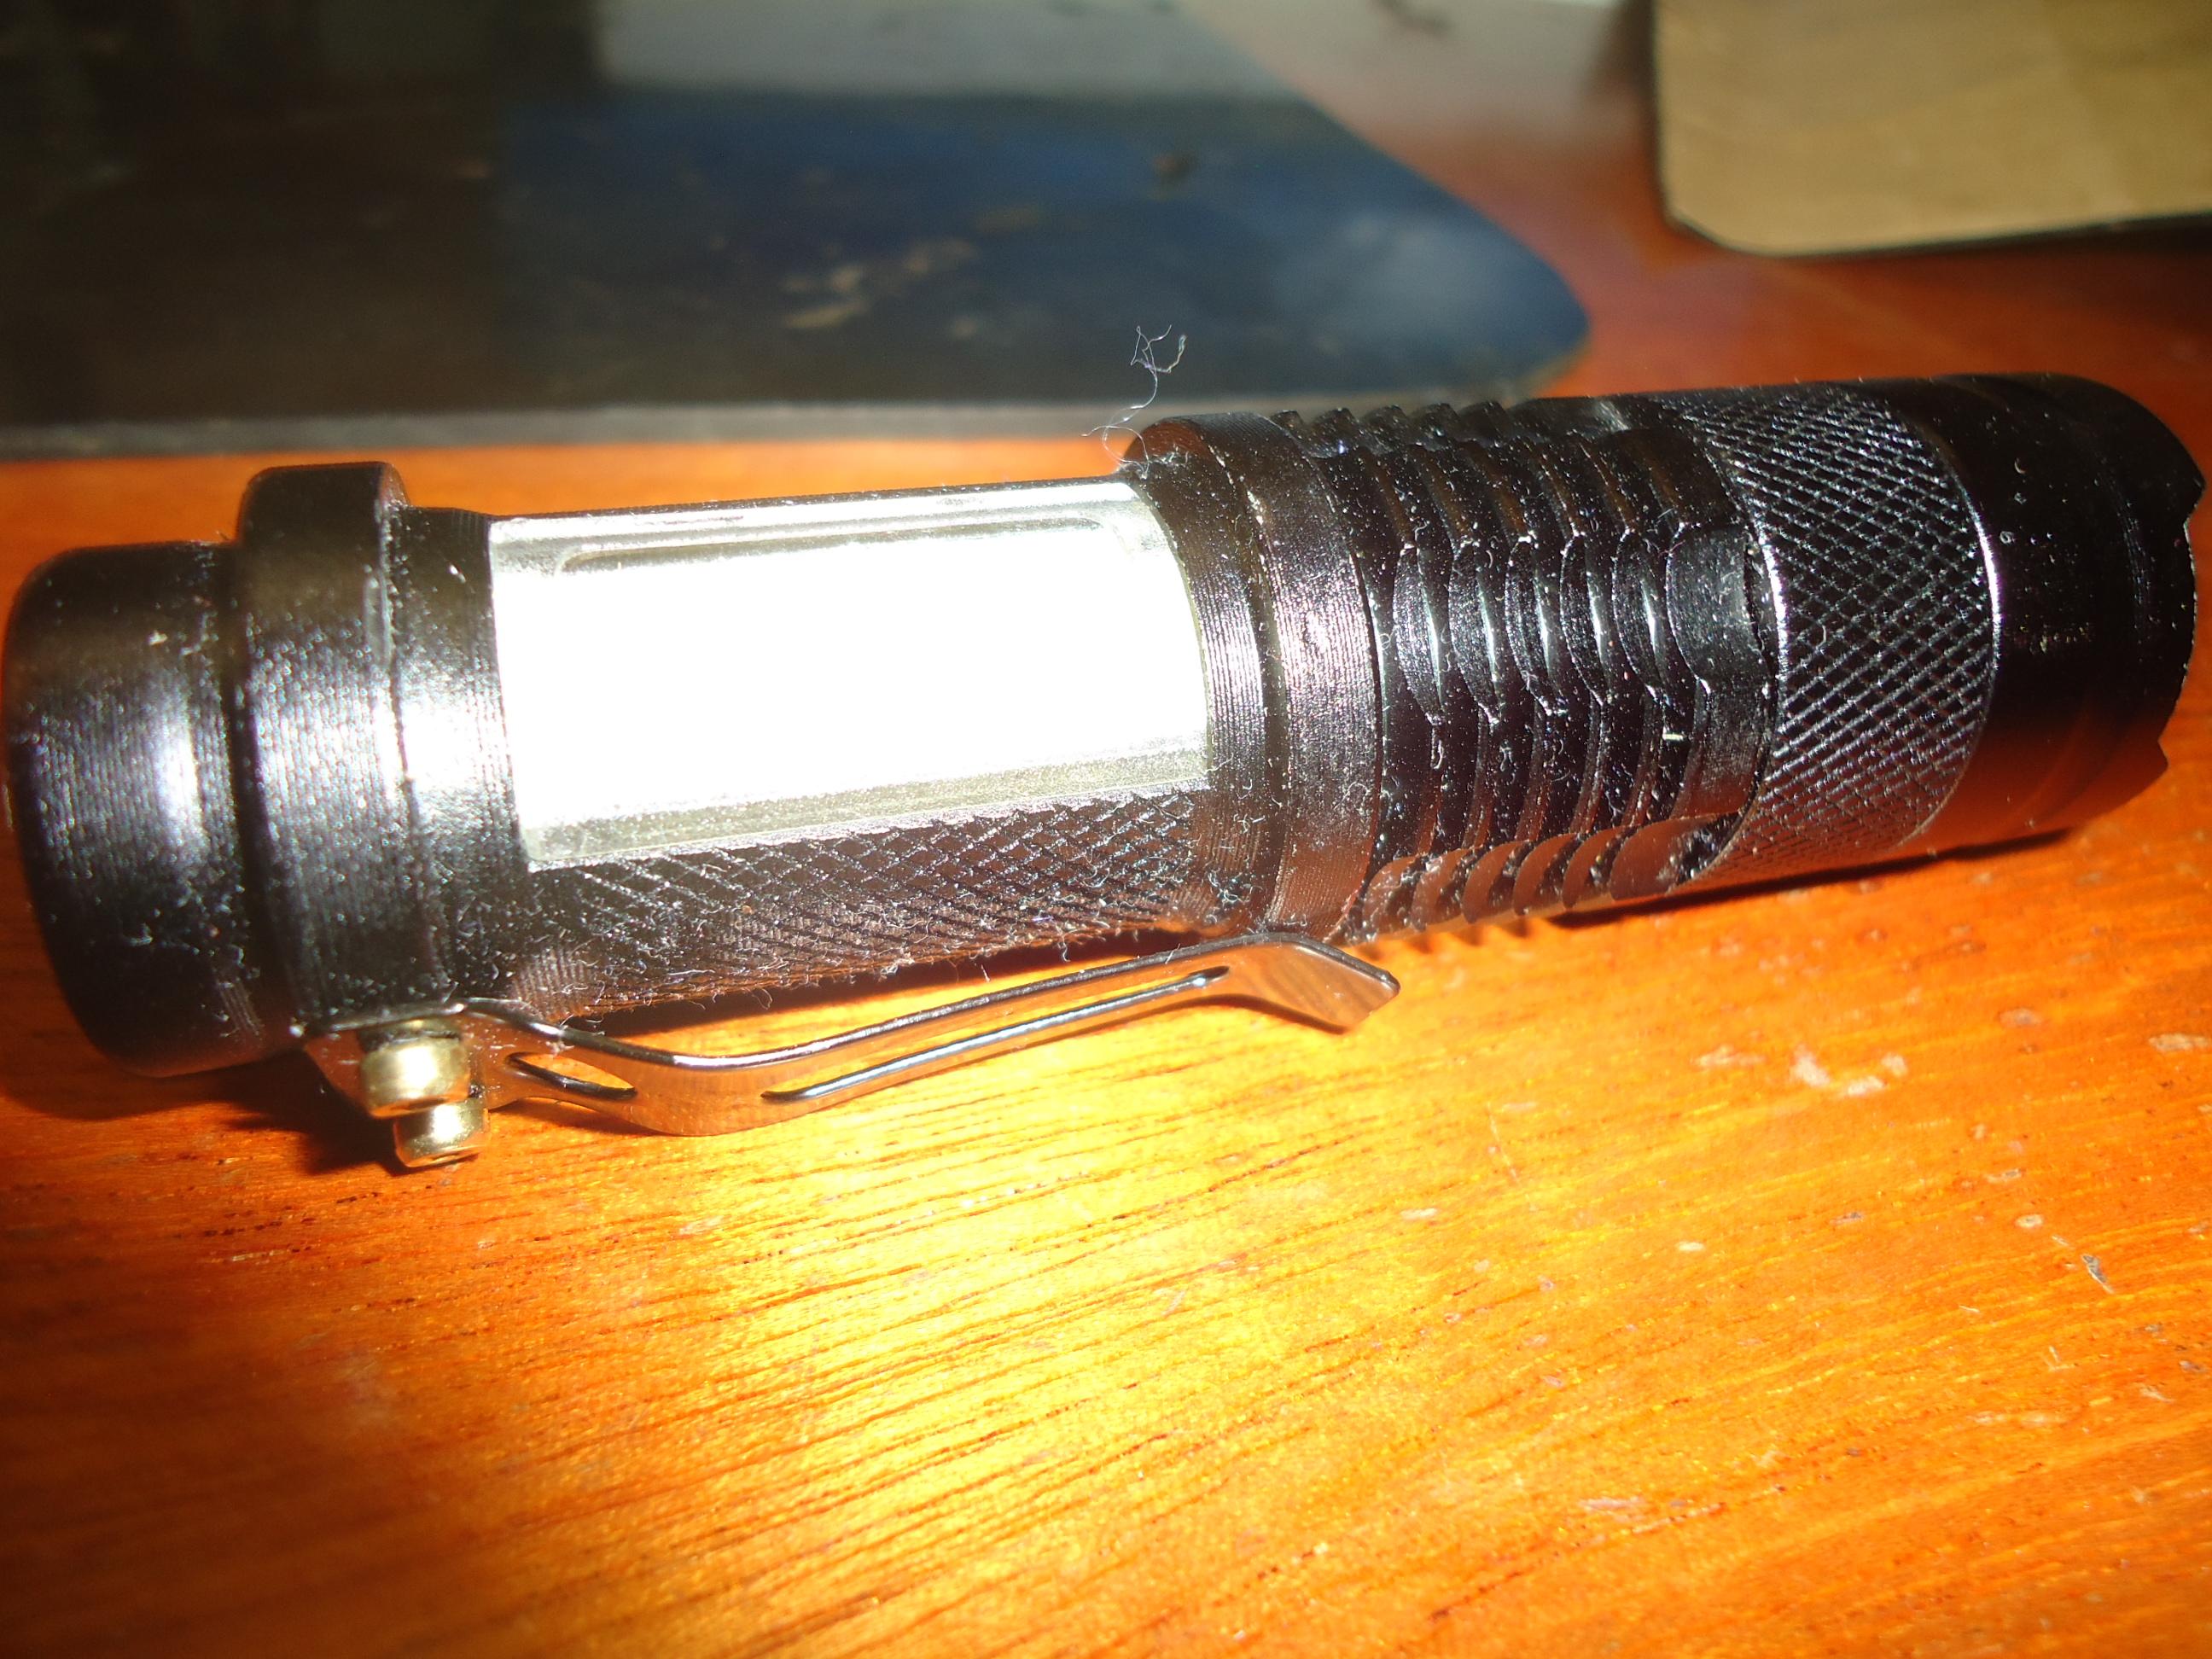 Foto de Lanterna LED Ultralight PRO, ligada na iluminação lateral. Feita com Câmera Digital Sony Cybershot DSC-W320.